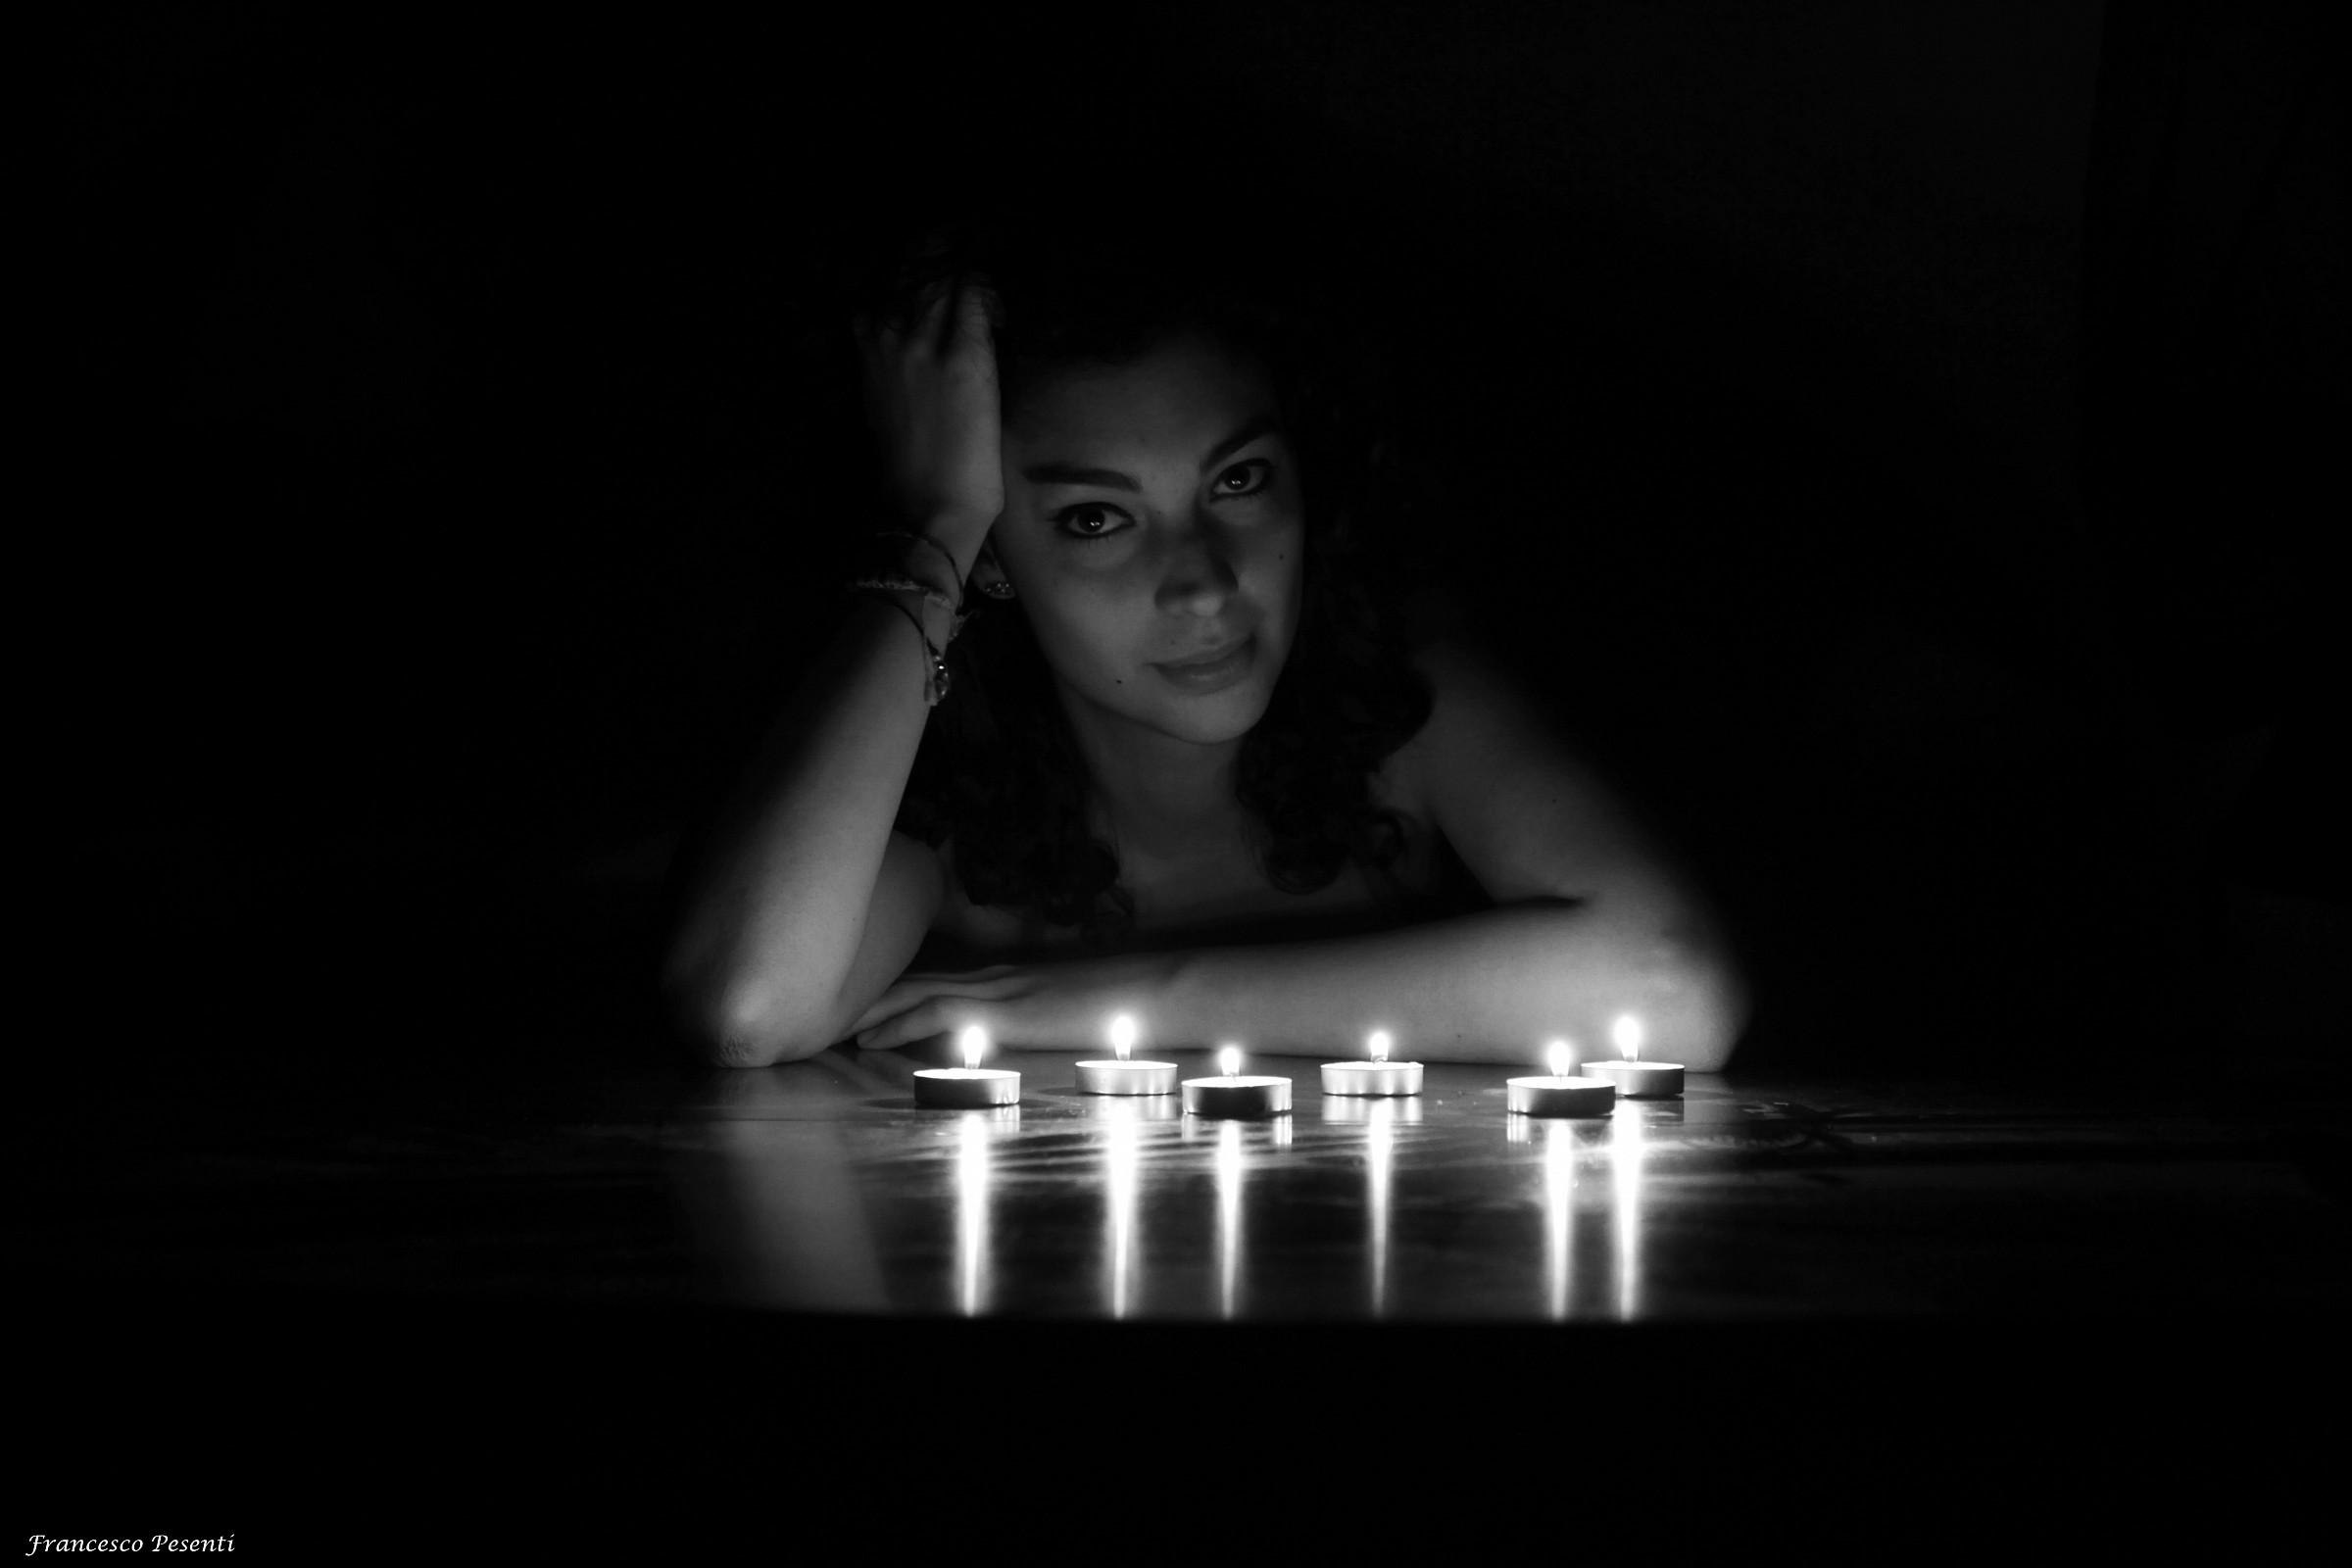 Candle 3...